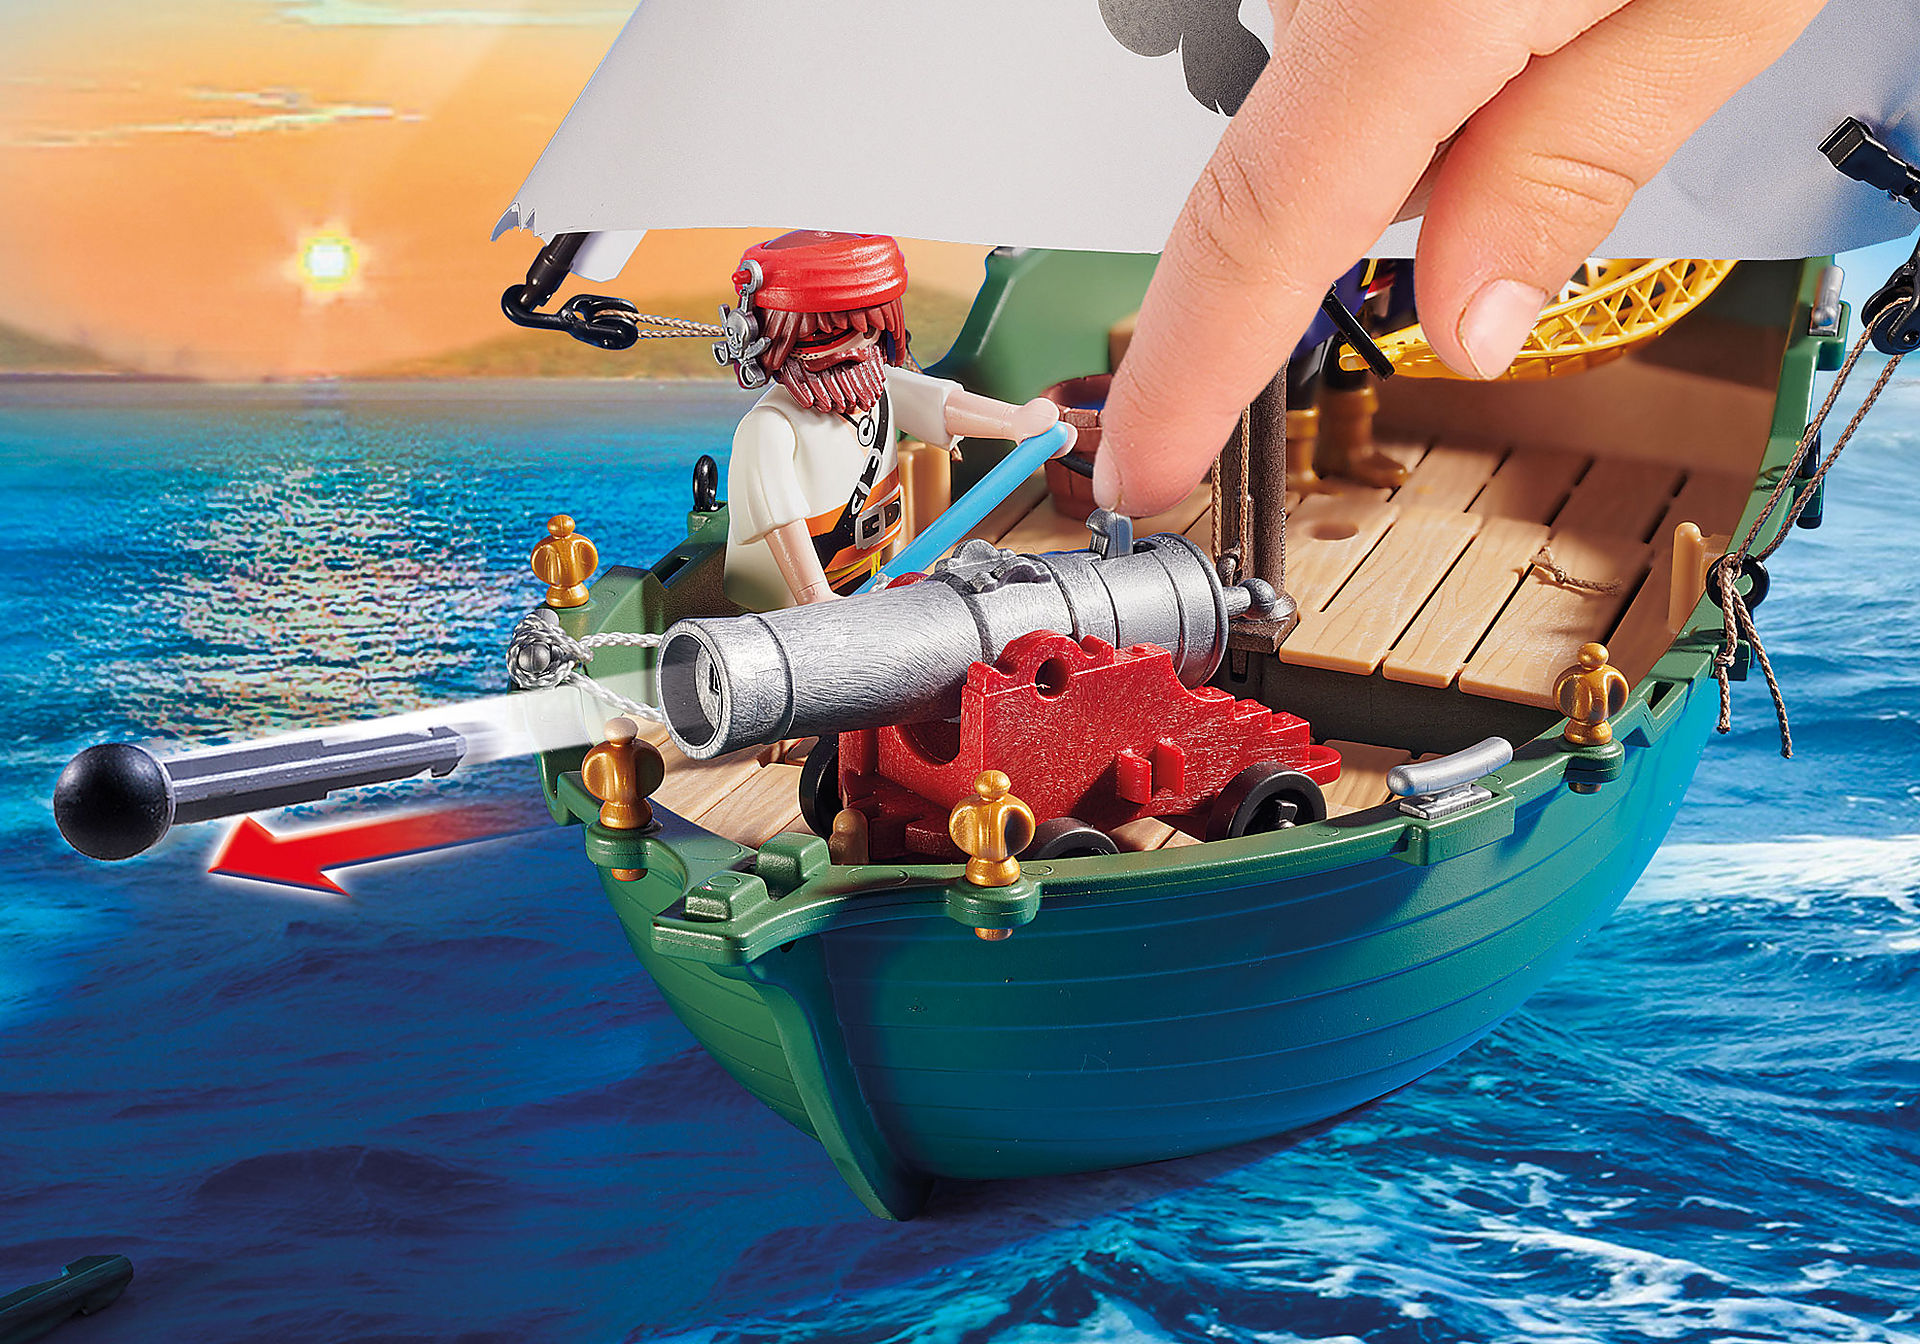 70151 Barco Pirata con motor submarino zoom image4